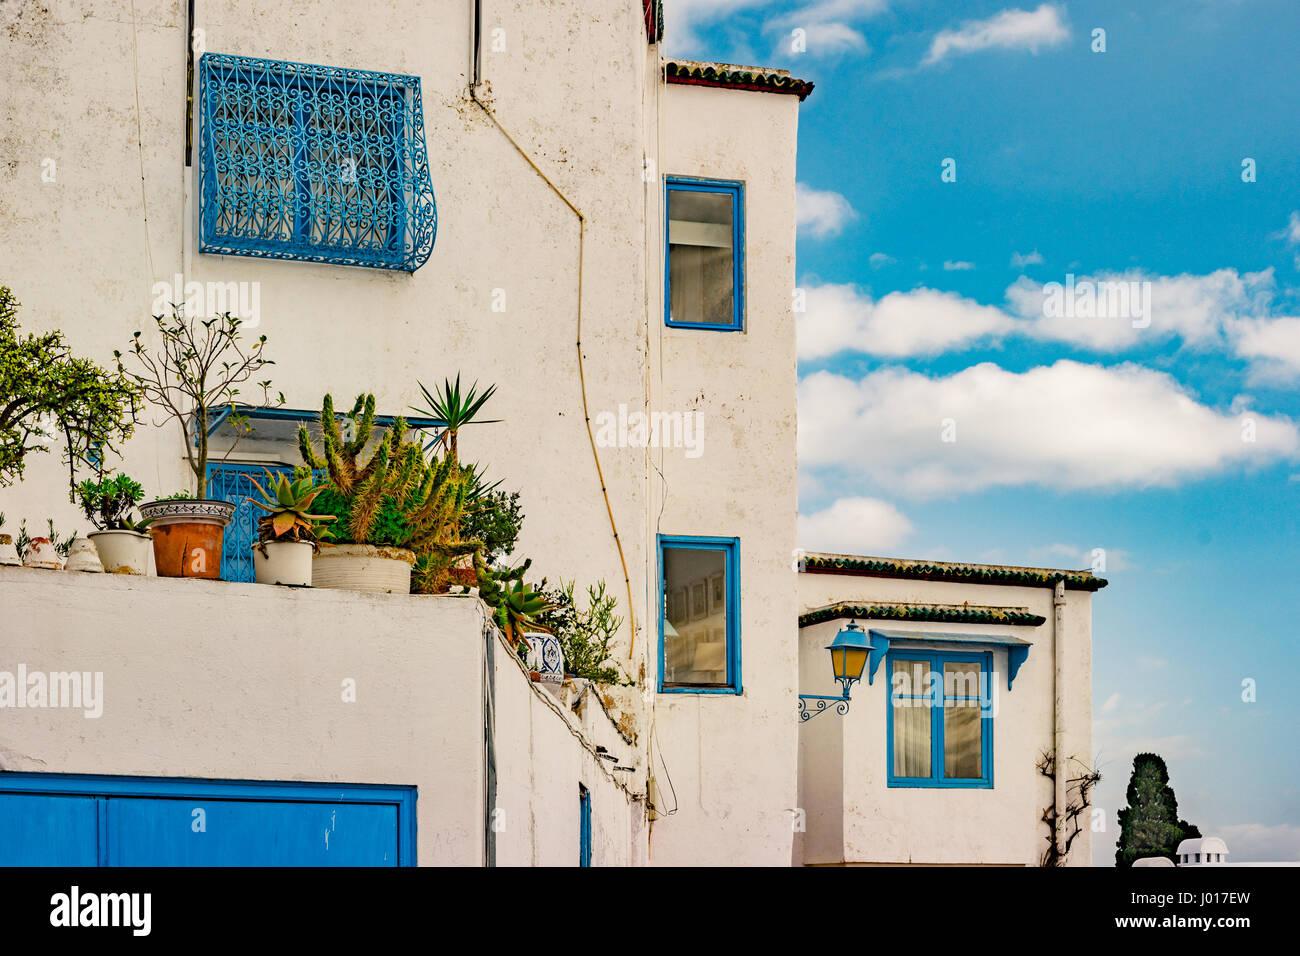 Sidi Bou Said, famouse village with traditional tunisian architecture. Stock Photo